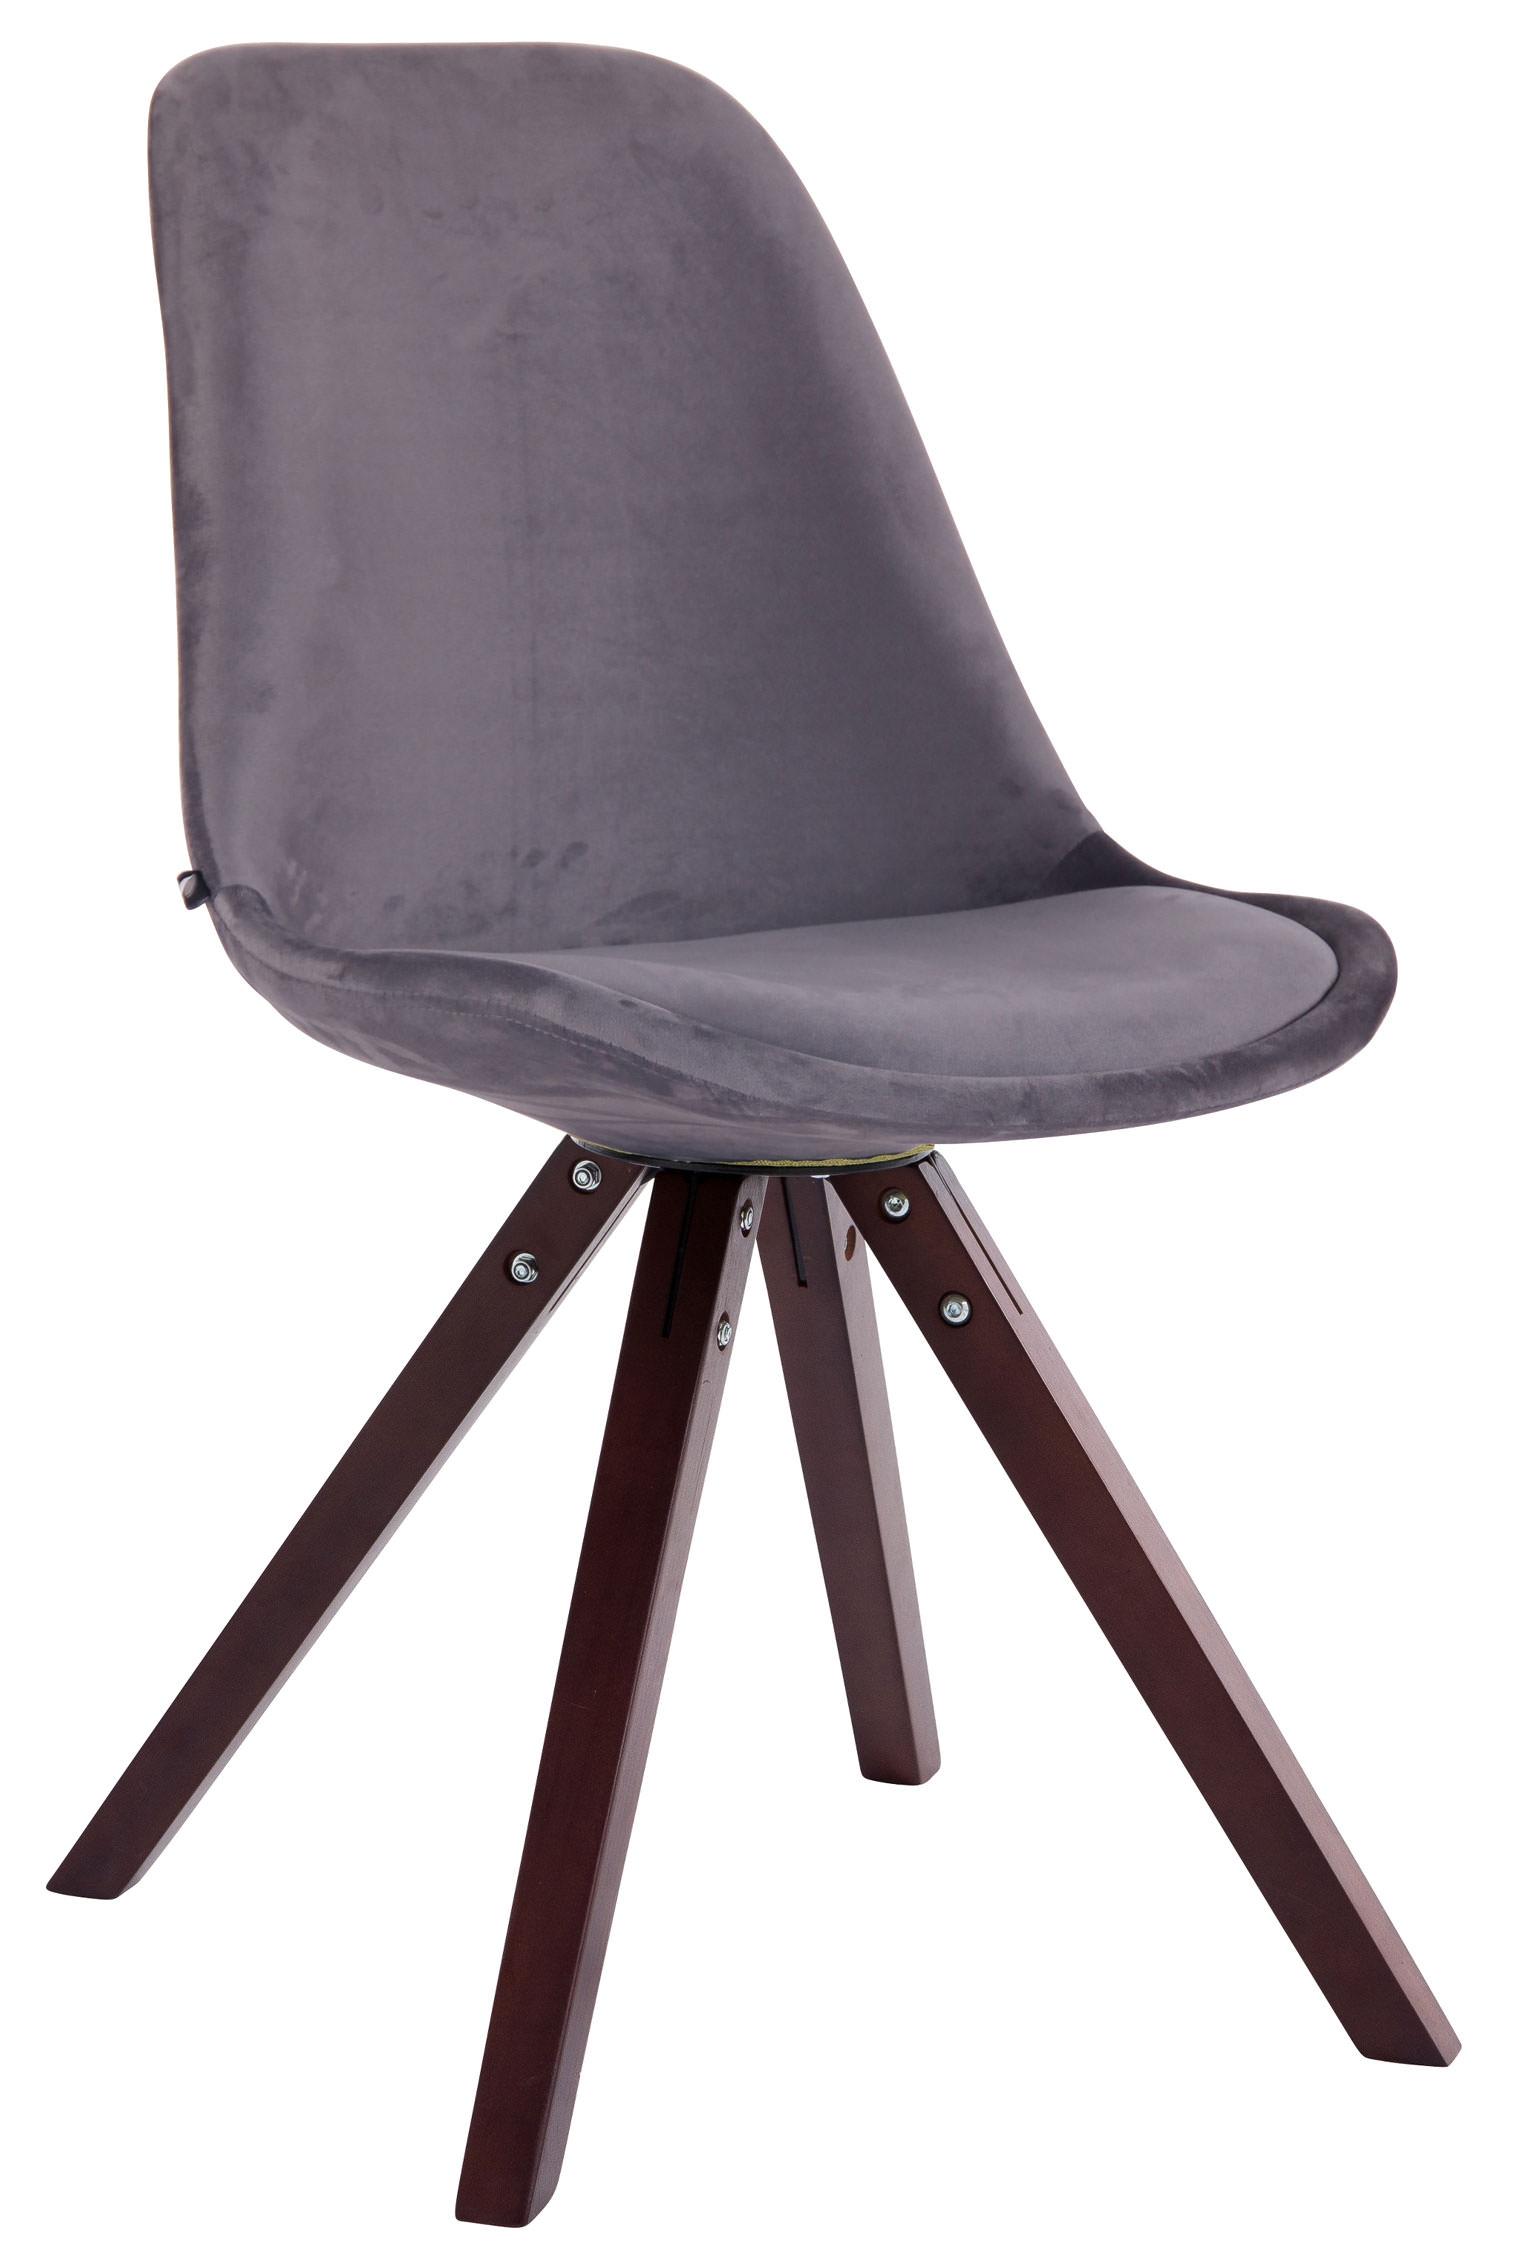 Besucherstuhl Toulouse Samt Square-dunkelgrau-Cappuccino | Büro > Bürostühle und Sessel  > Besucherstühle | Larico Design Möbel